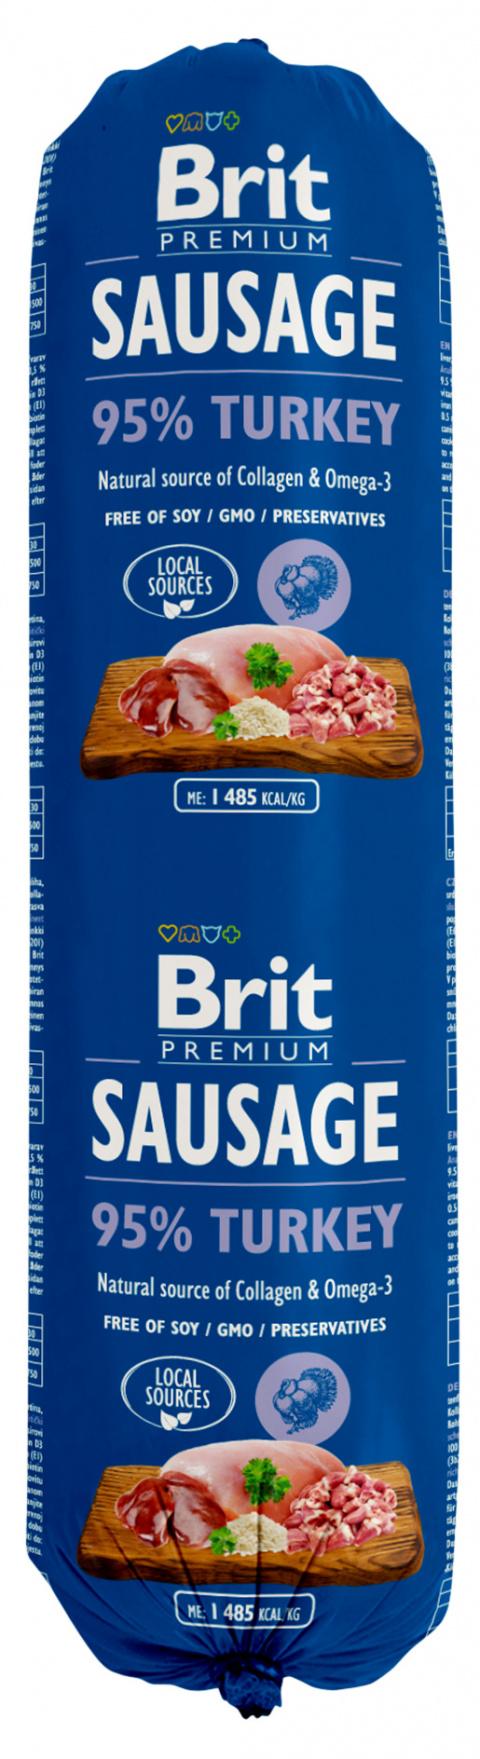 Konservi suņiem - Brit Sausage Turkey, 800 g title=